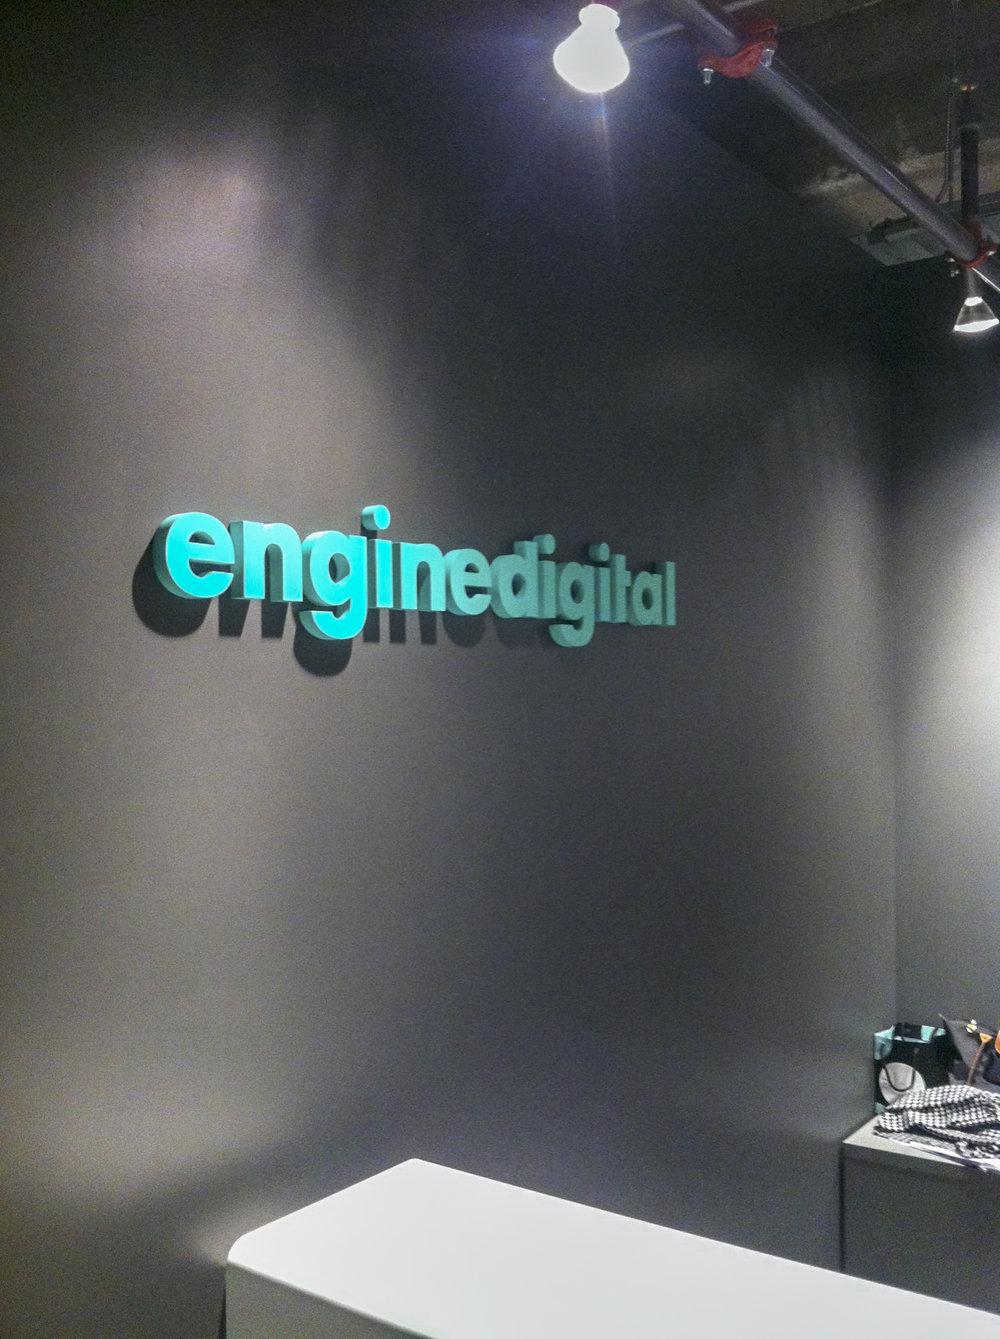 engineDigital.jpg